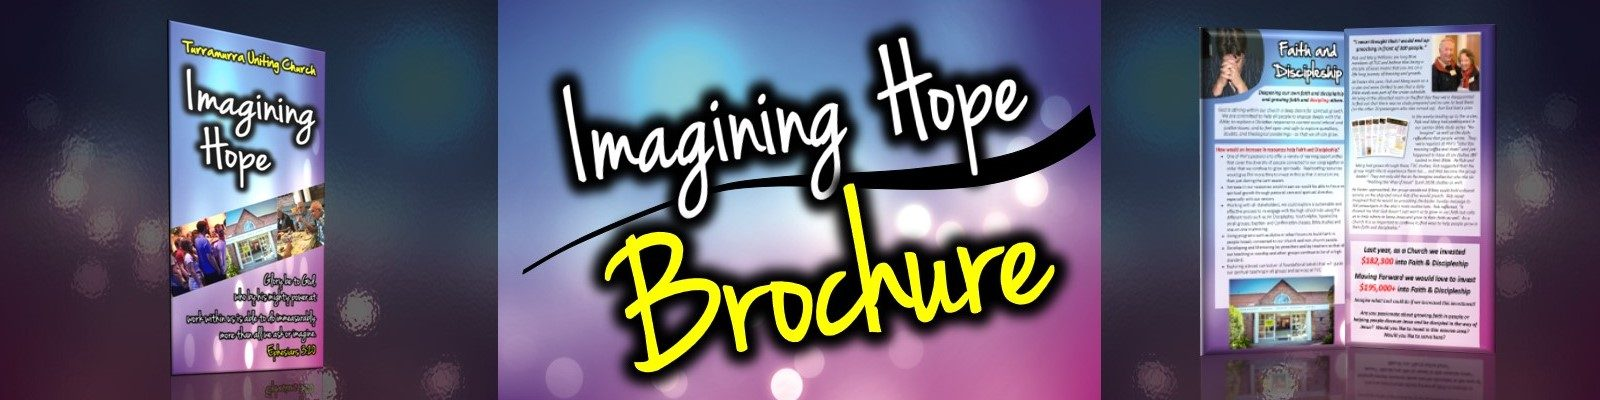 Imagining Hope Brochure